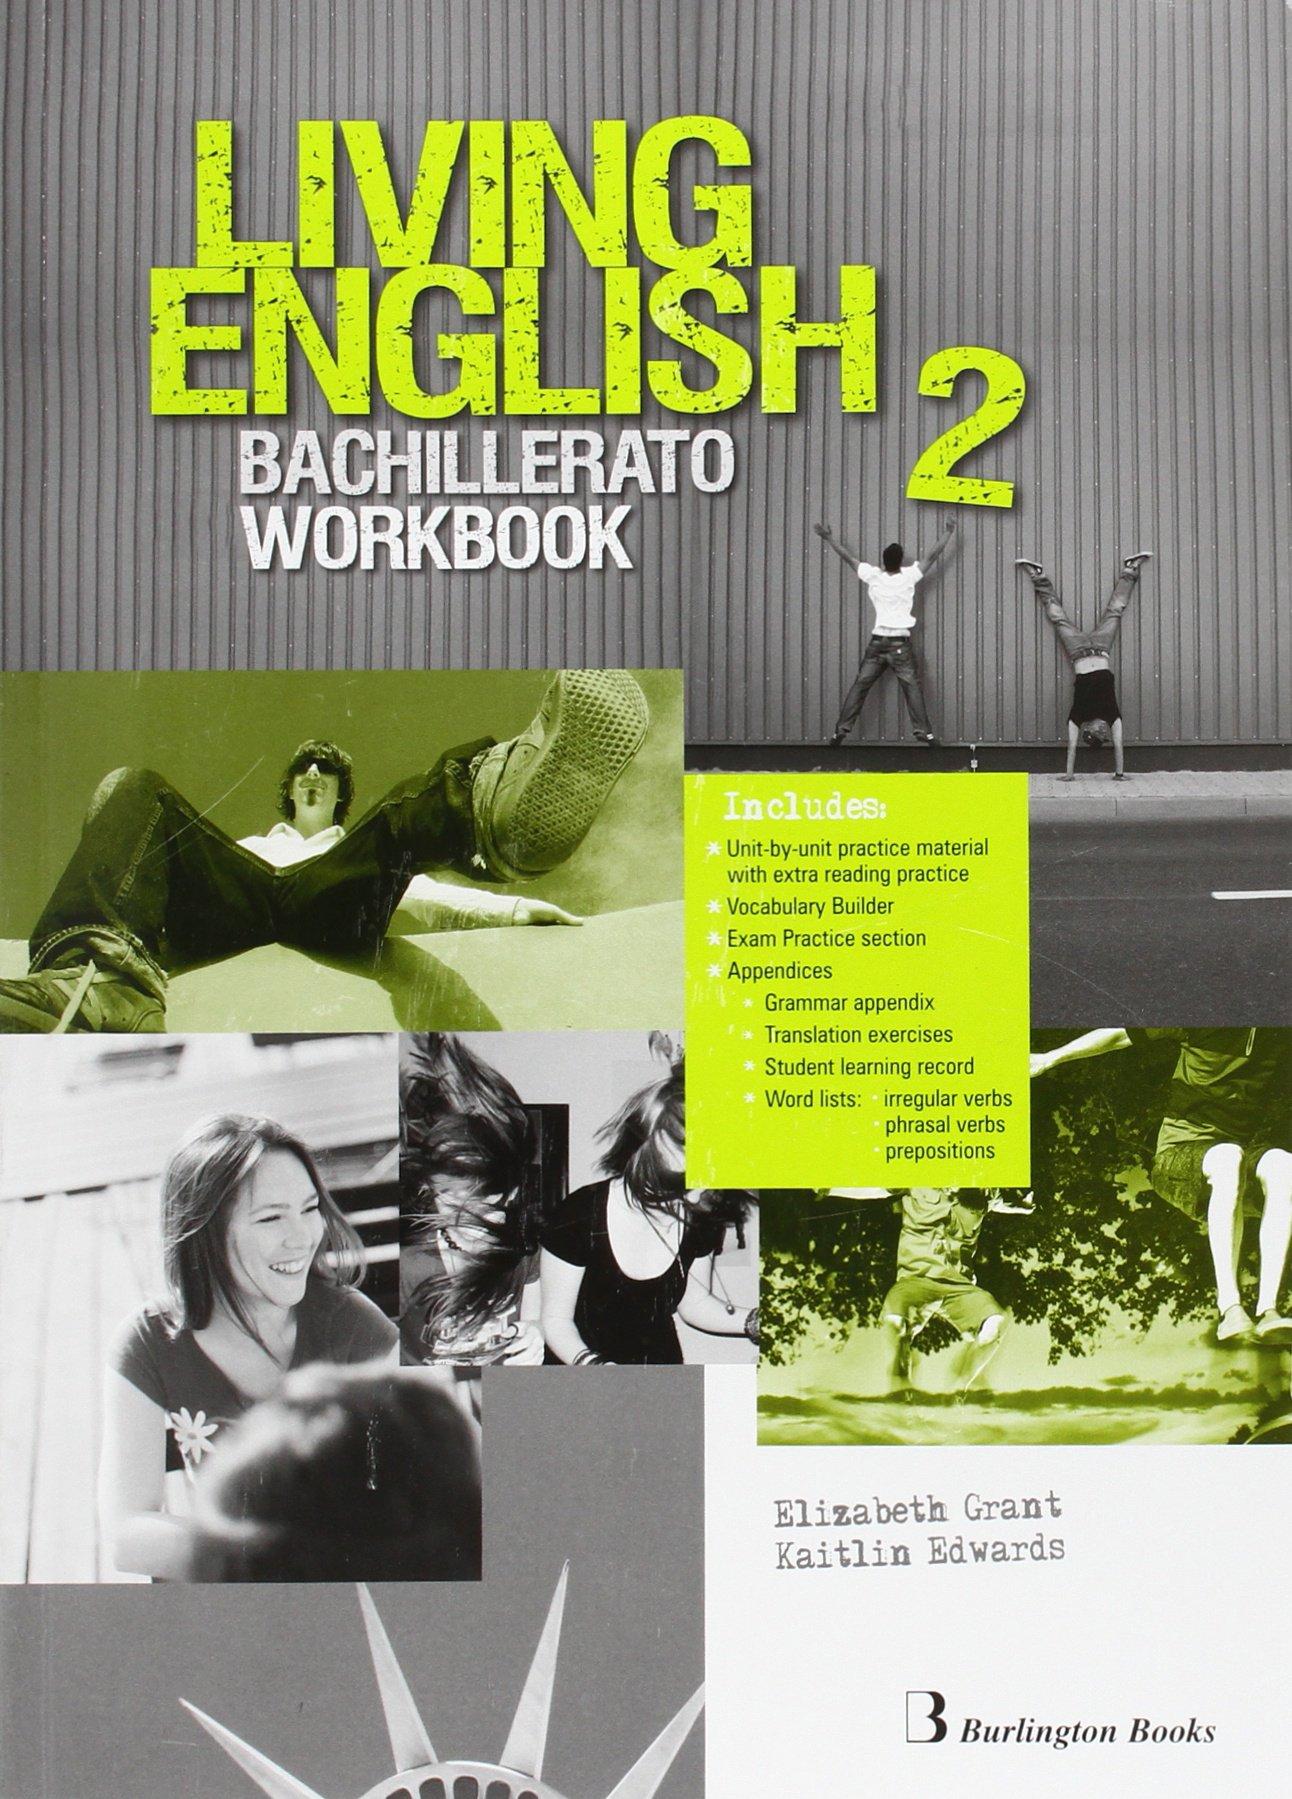 Living english 2º Bachillerato: Workbook - 9789963489985 (Inglés) Tapa blanda – 2015 Vv.Aa BURLINGTON 9963489982